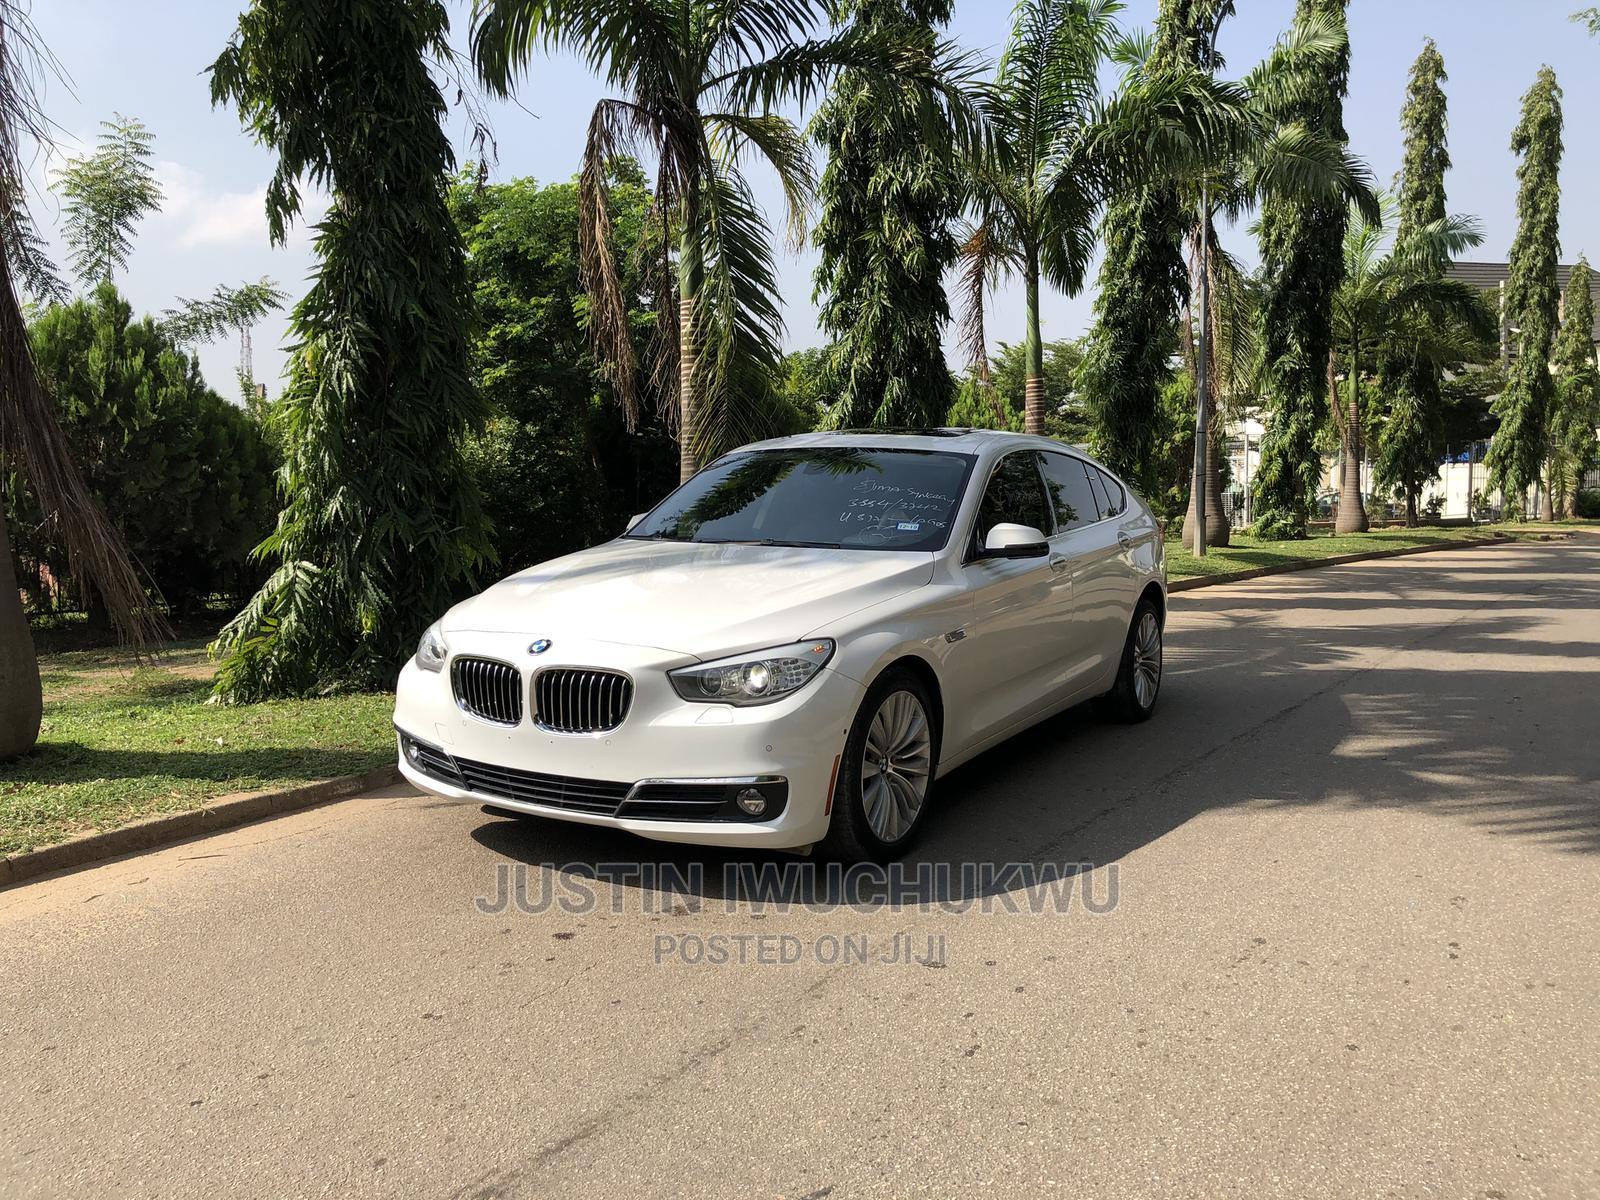 Archive: BMW X5 2014 White